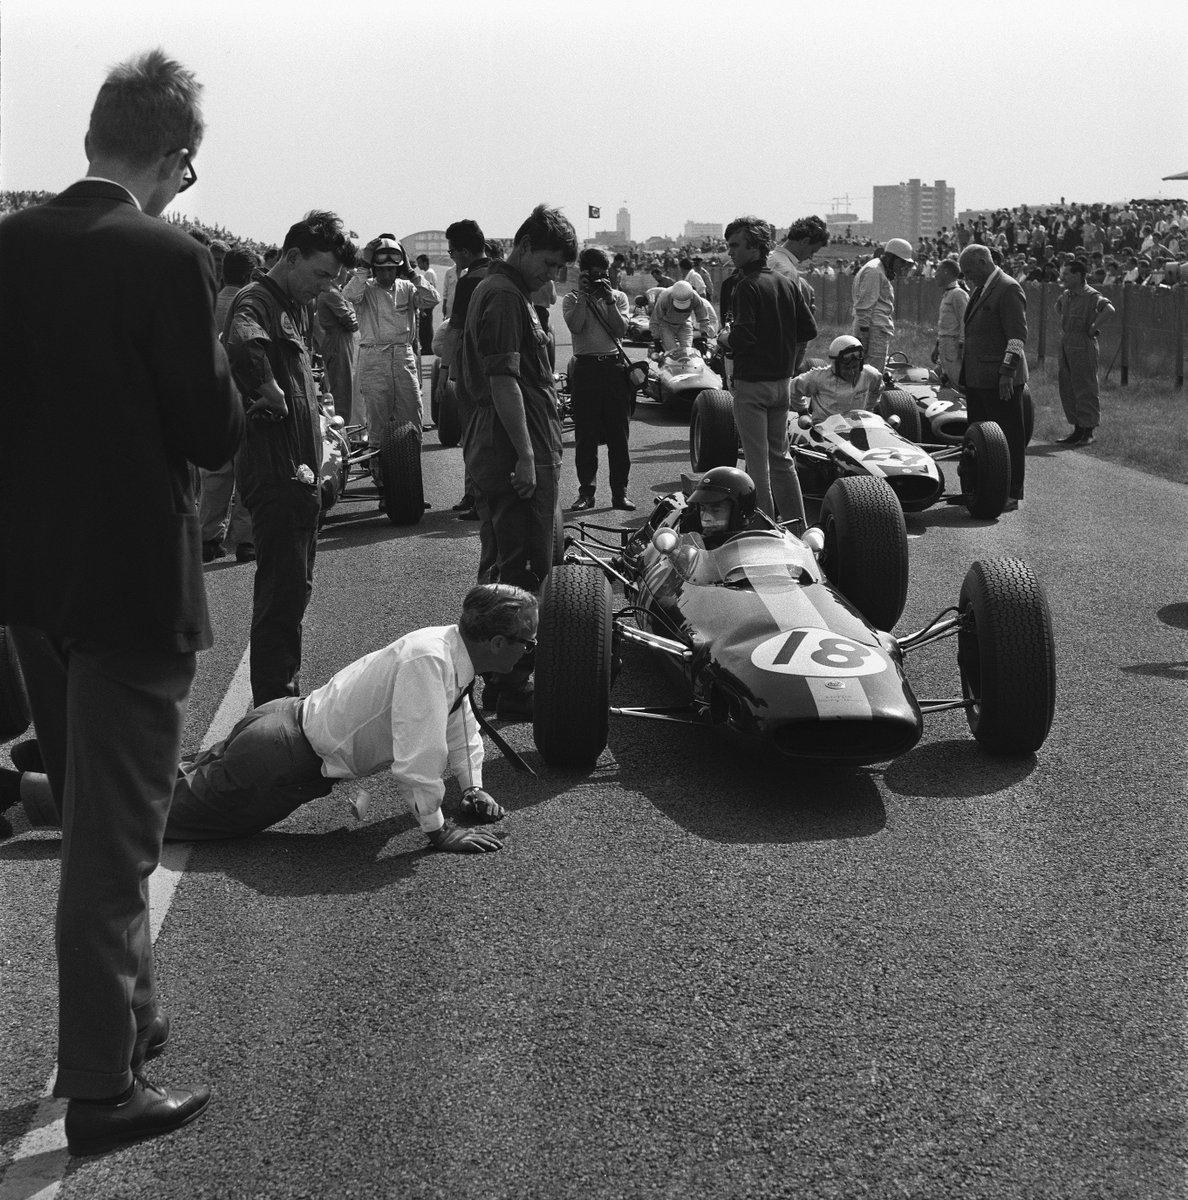 #OnThisDay 1964, Jim Clark in Lotus 25 won the #DutchGP, having lapped all but John Surtees. Pic via @PeterDWindsor https://t.co/ViYXtvU692